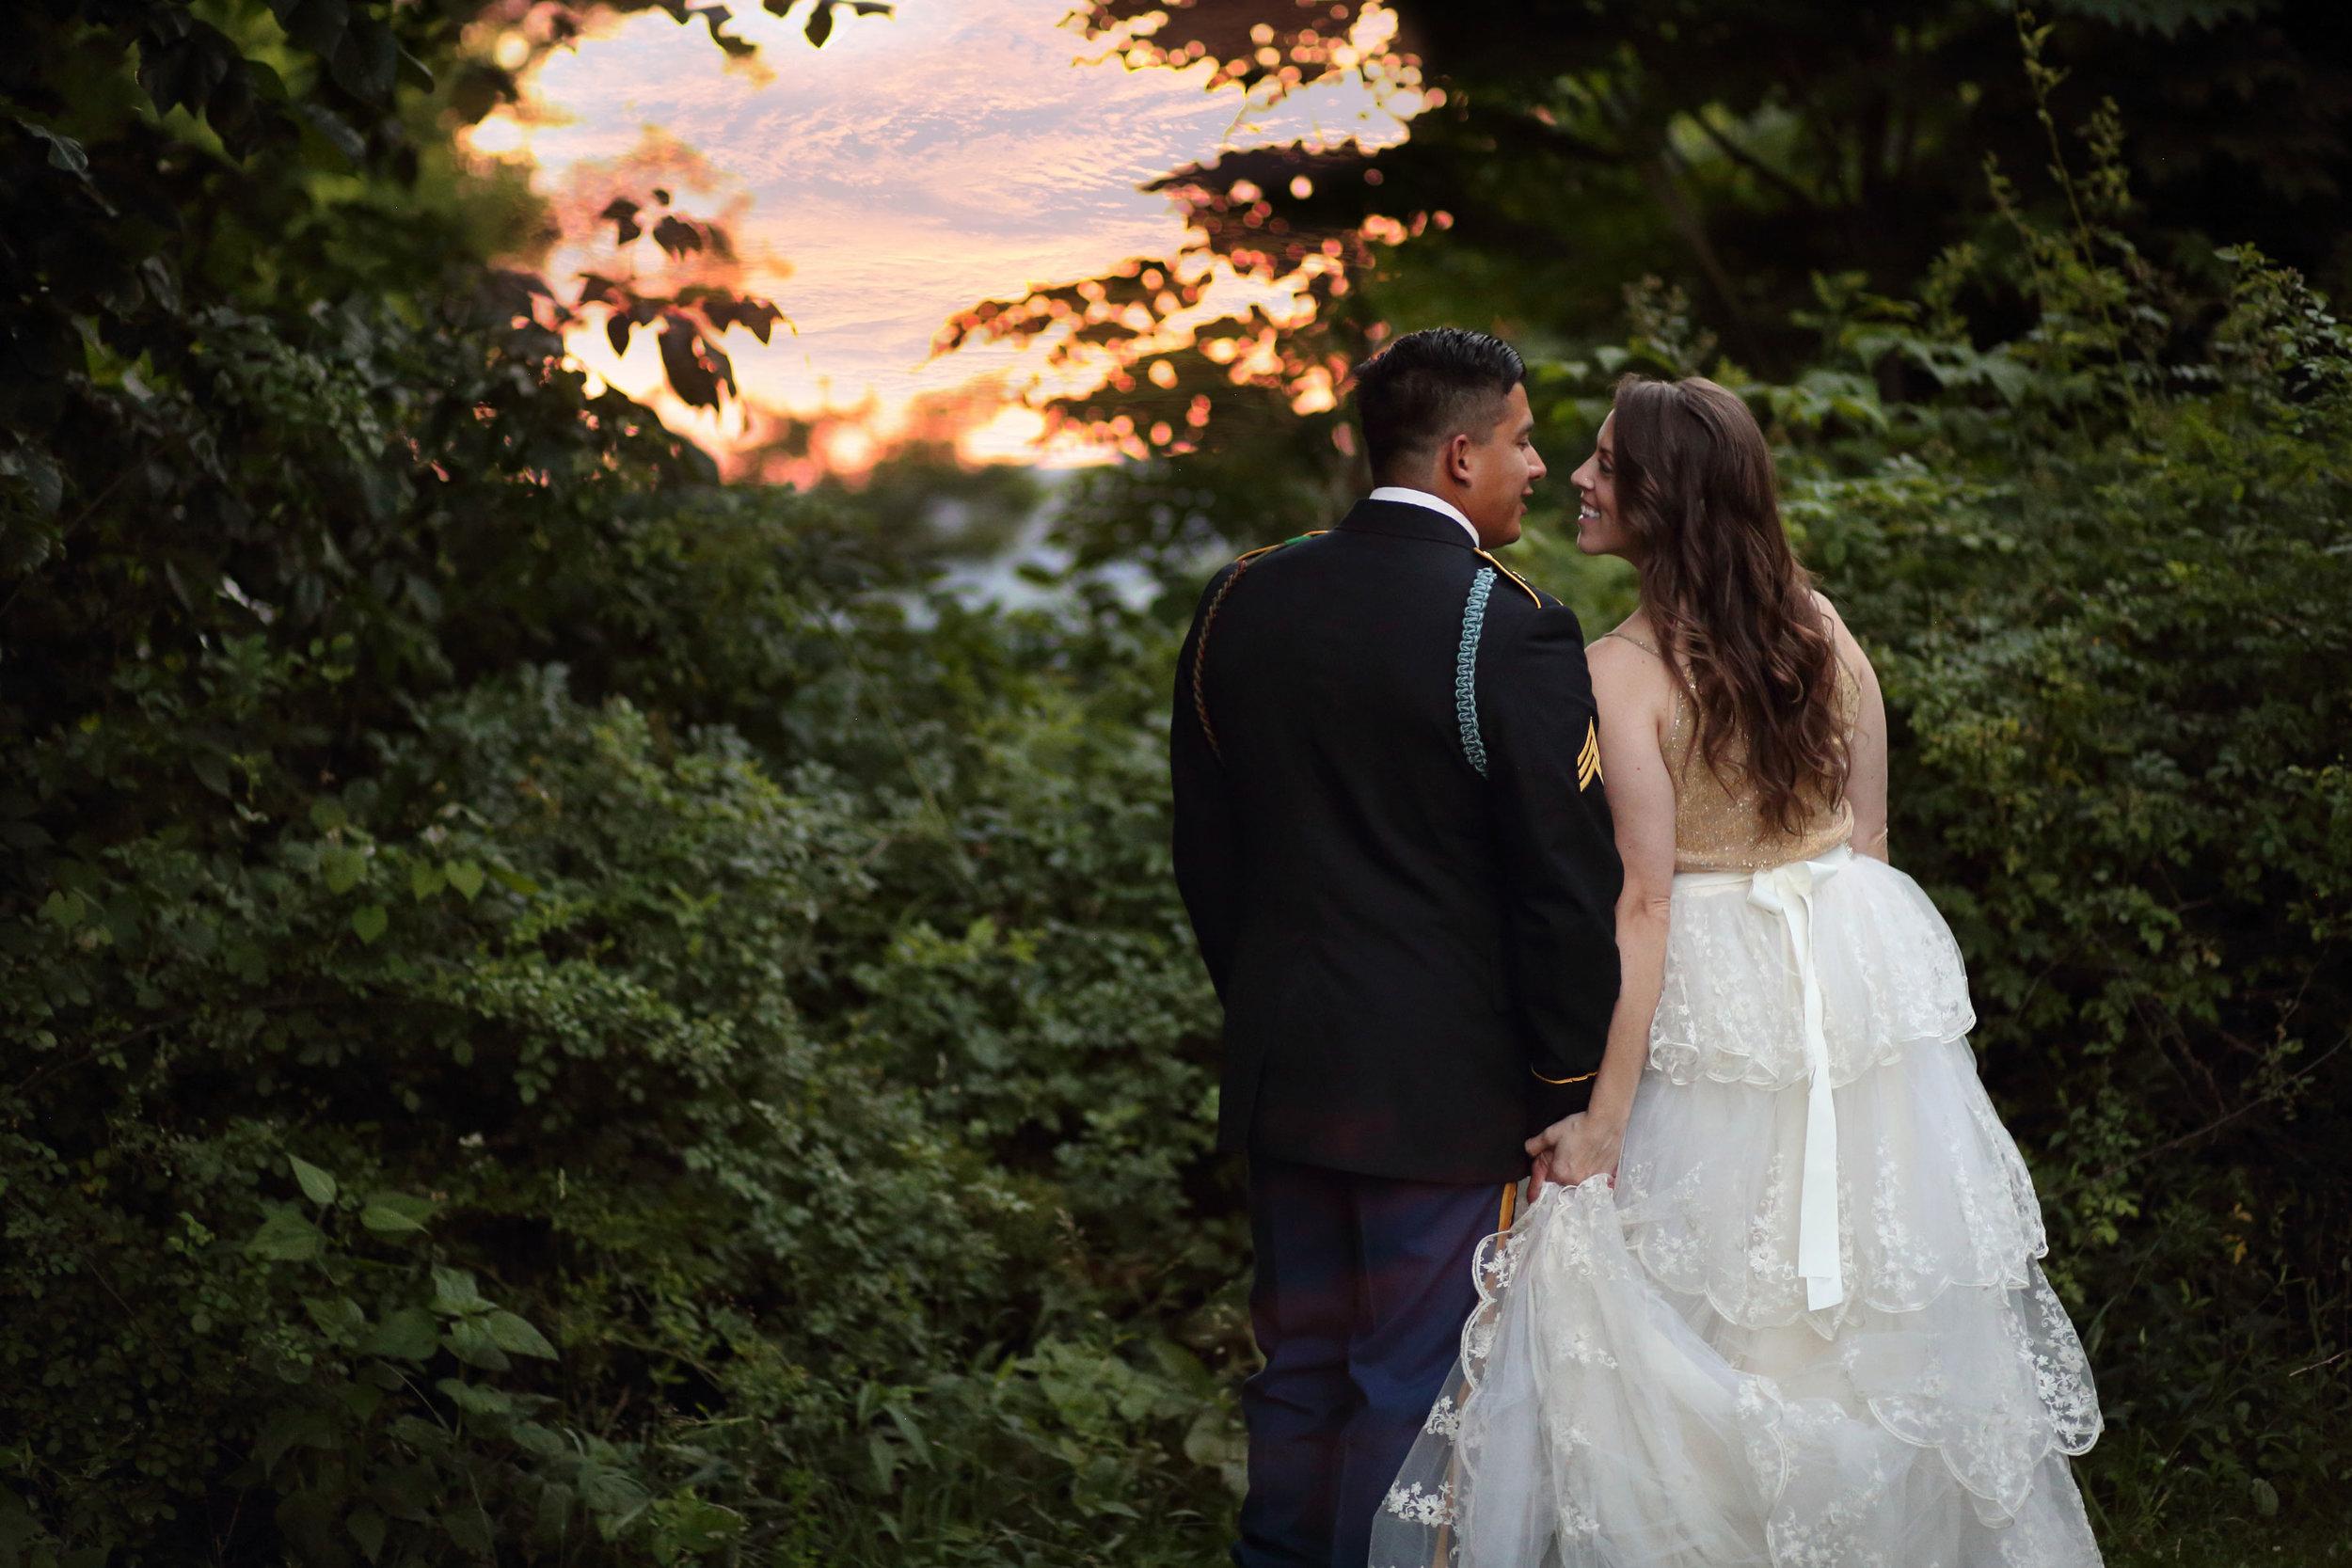 Tamara-Green_Wedding-Photography-7.jpg